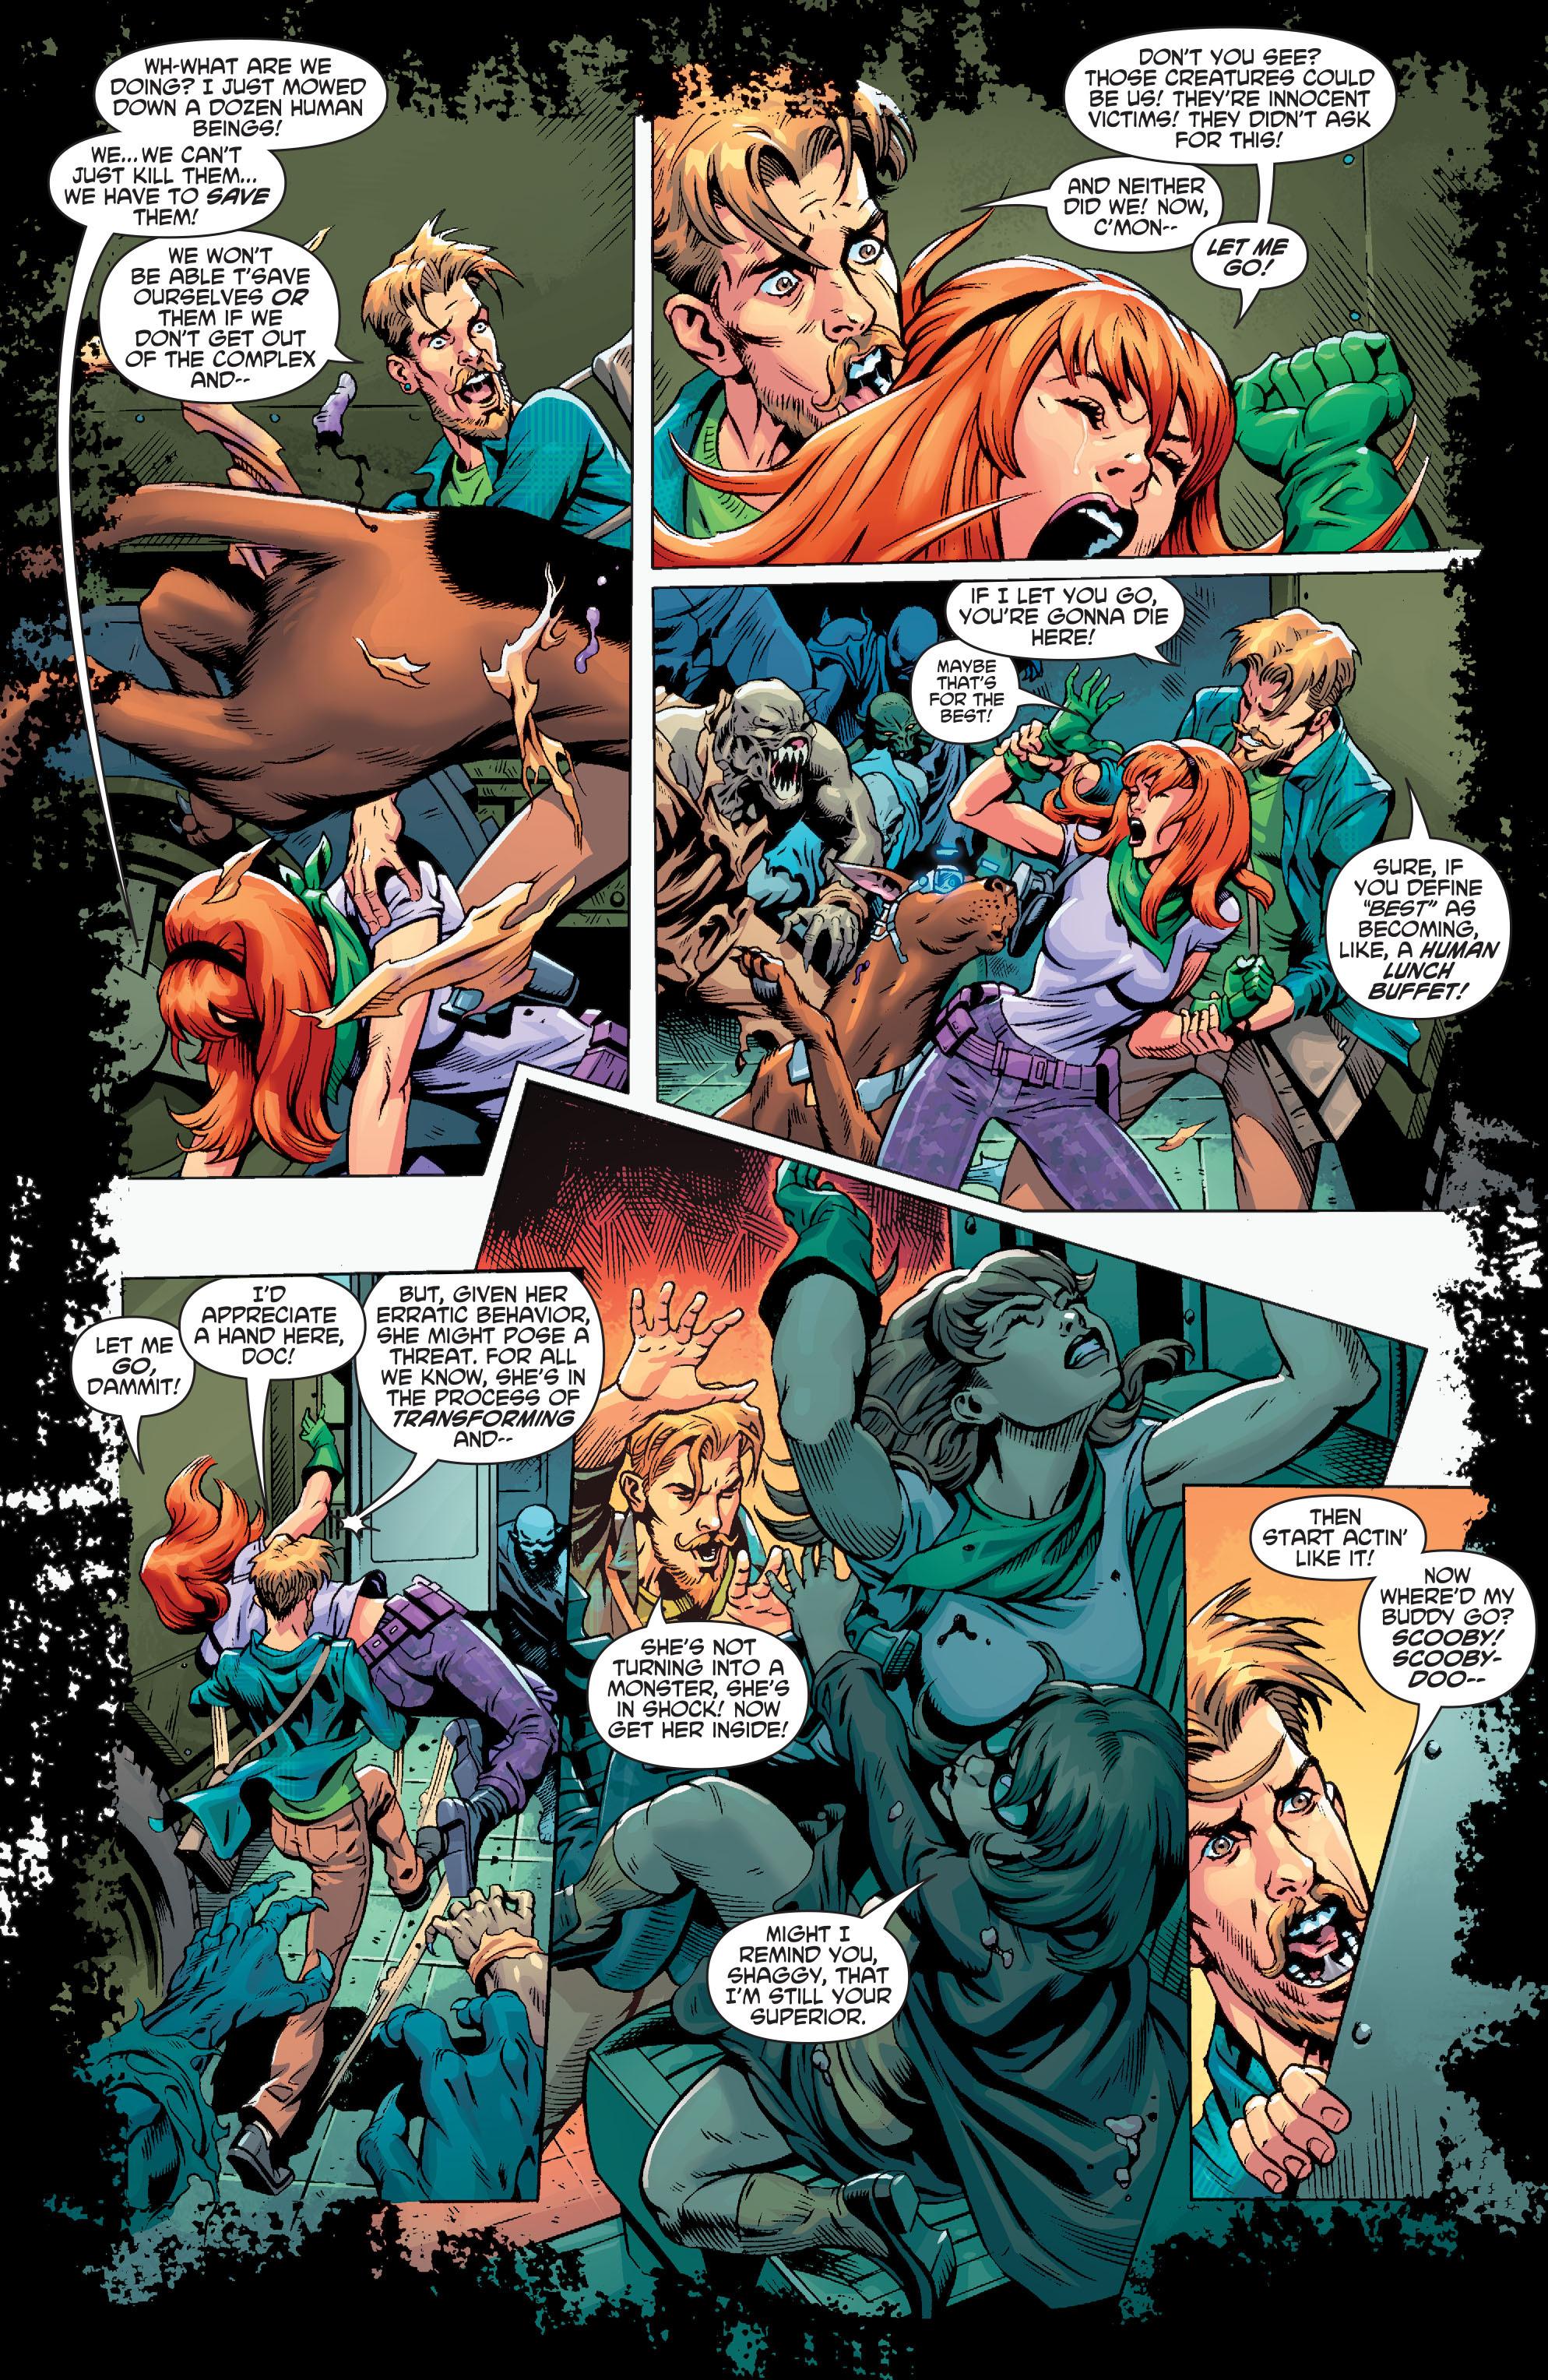 Read online Scooby Apocalypse comic -  Issue #3 - 10